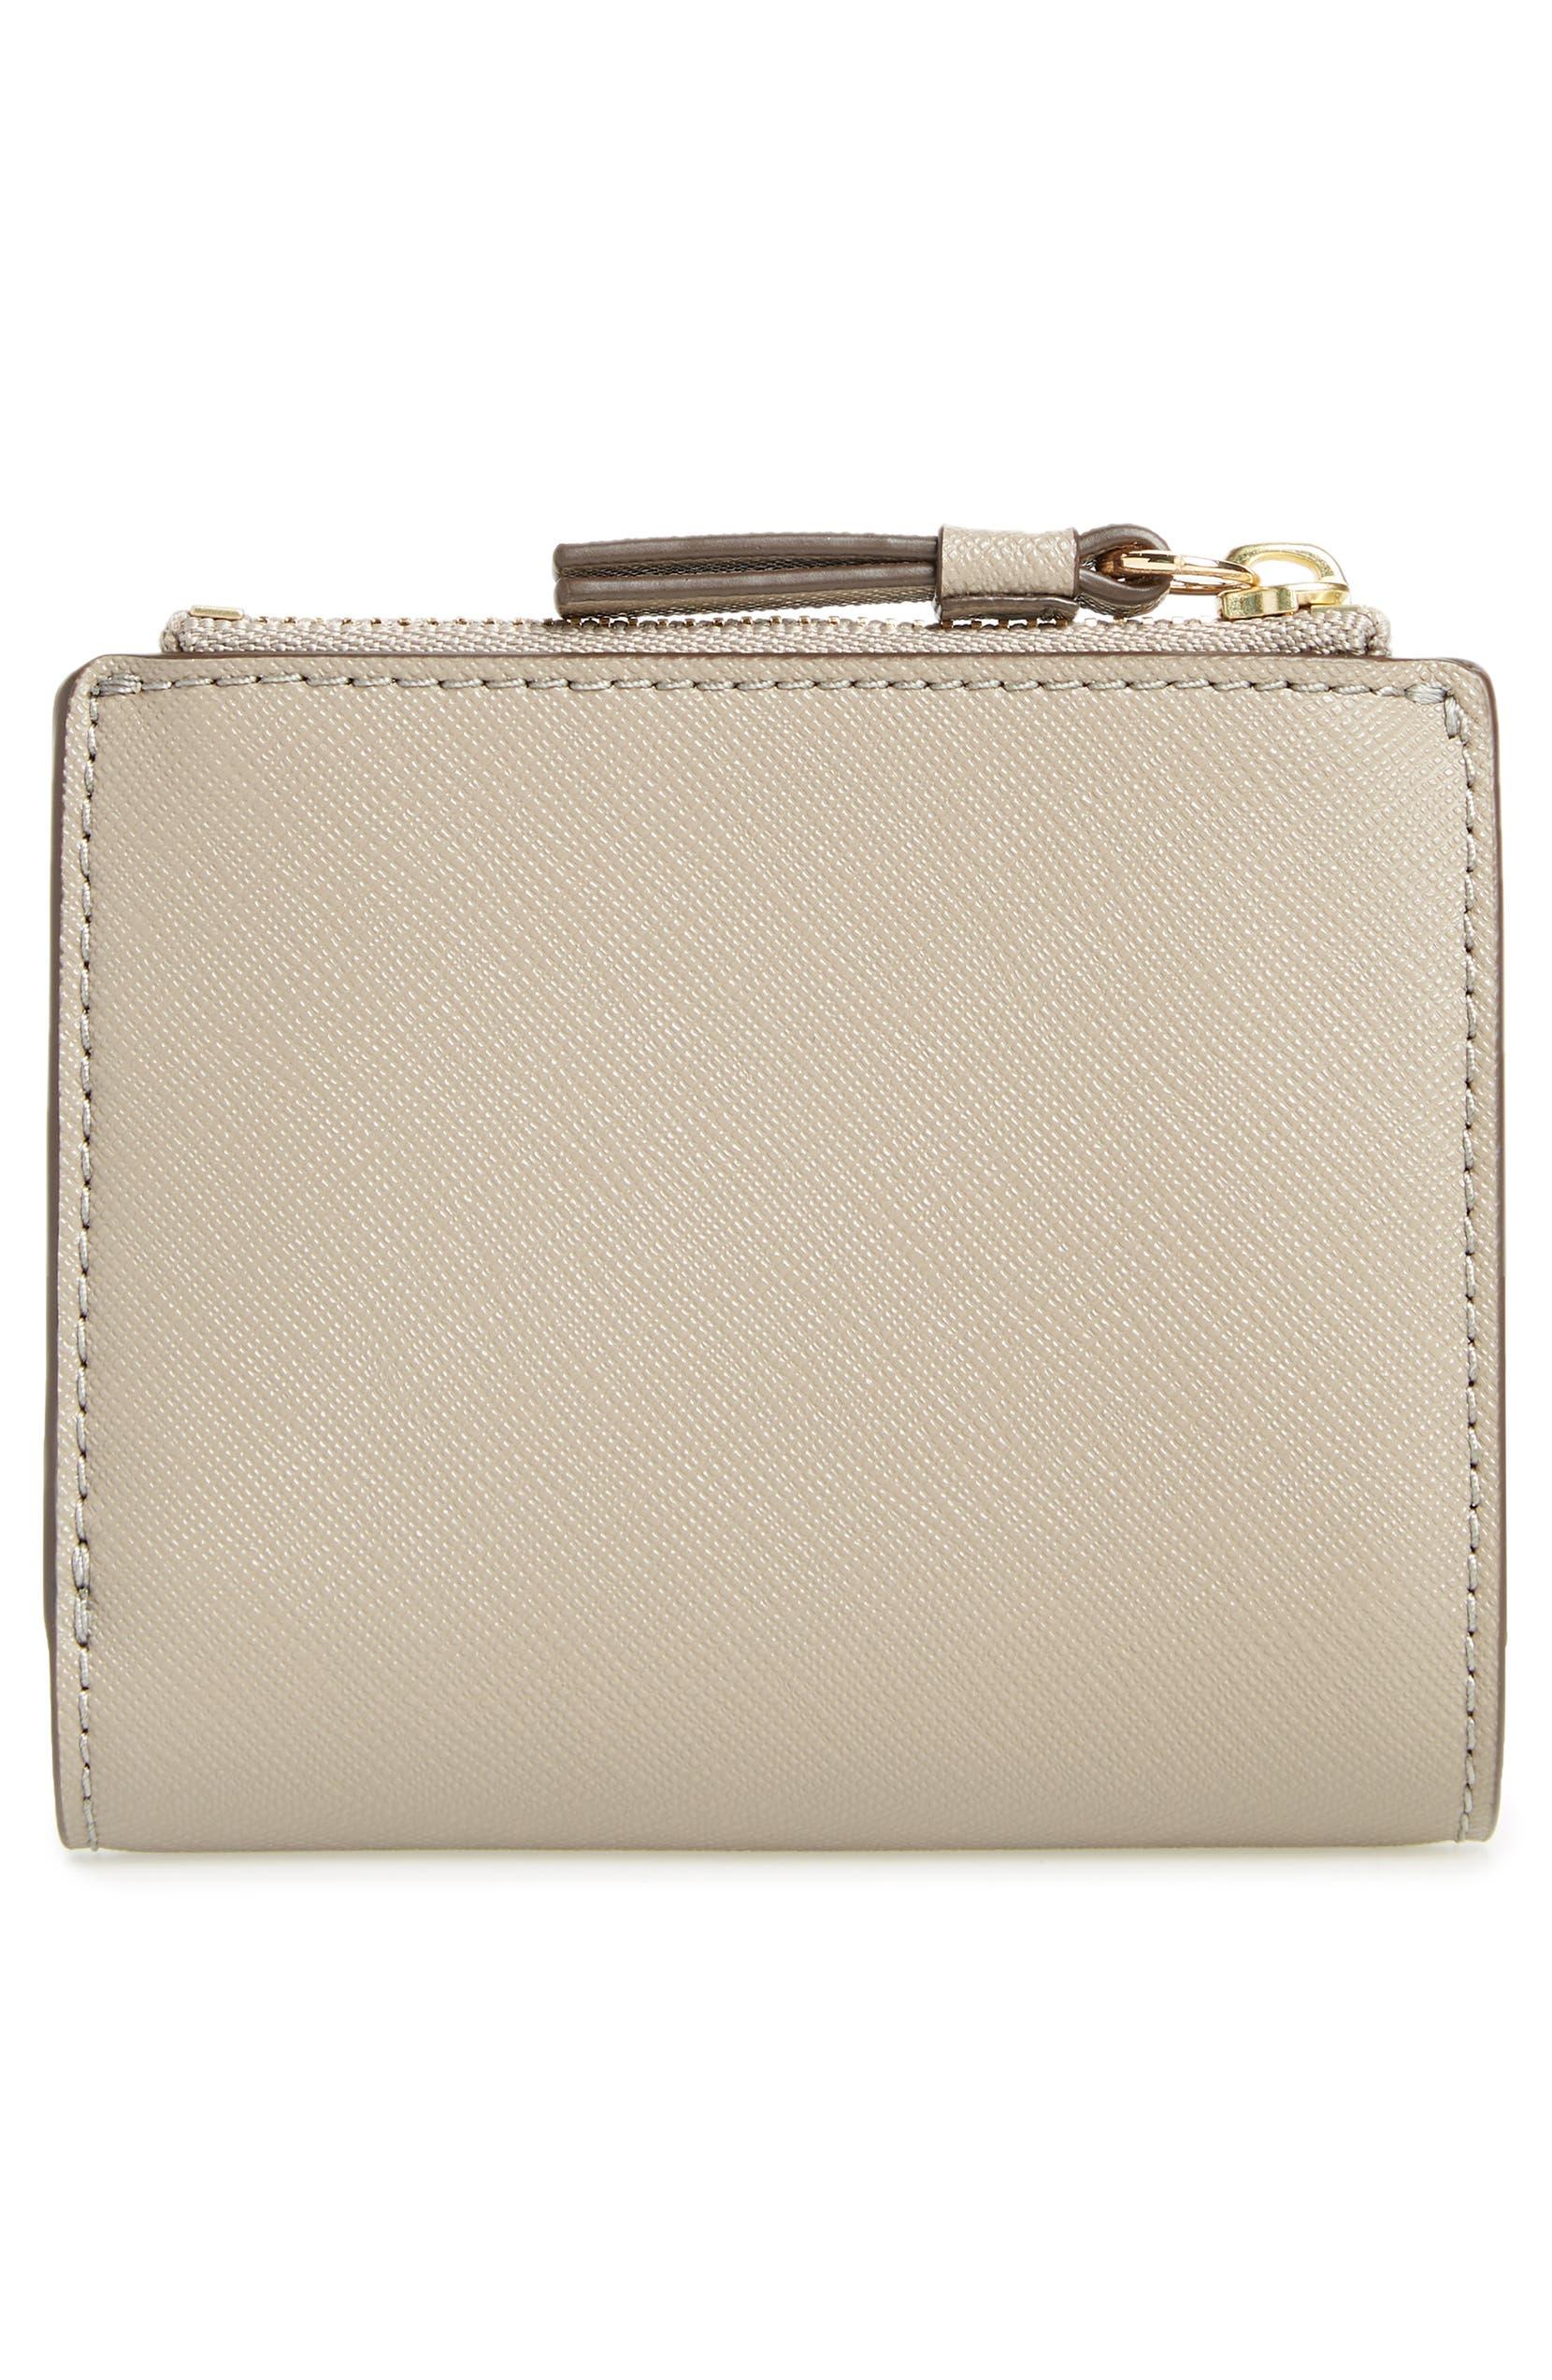 b78e5654a006 Tory Burch Mini Robinson Wallet Leather Bifold Wallet